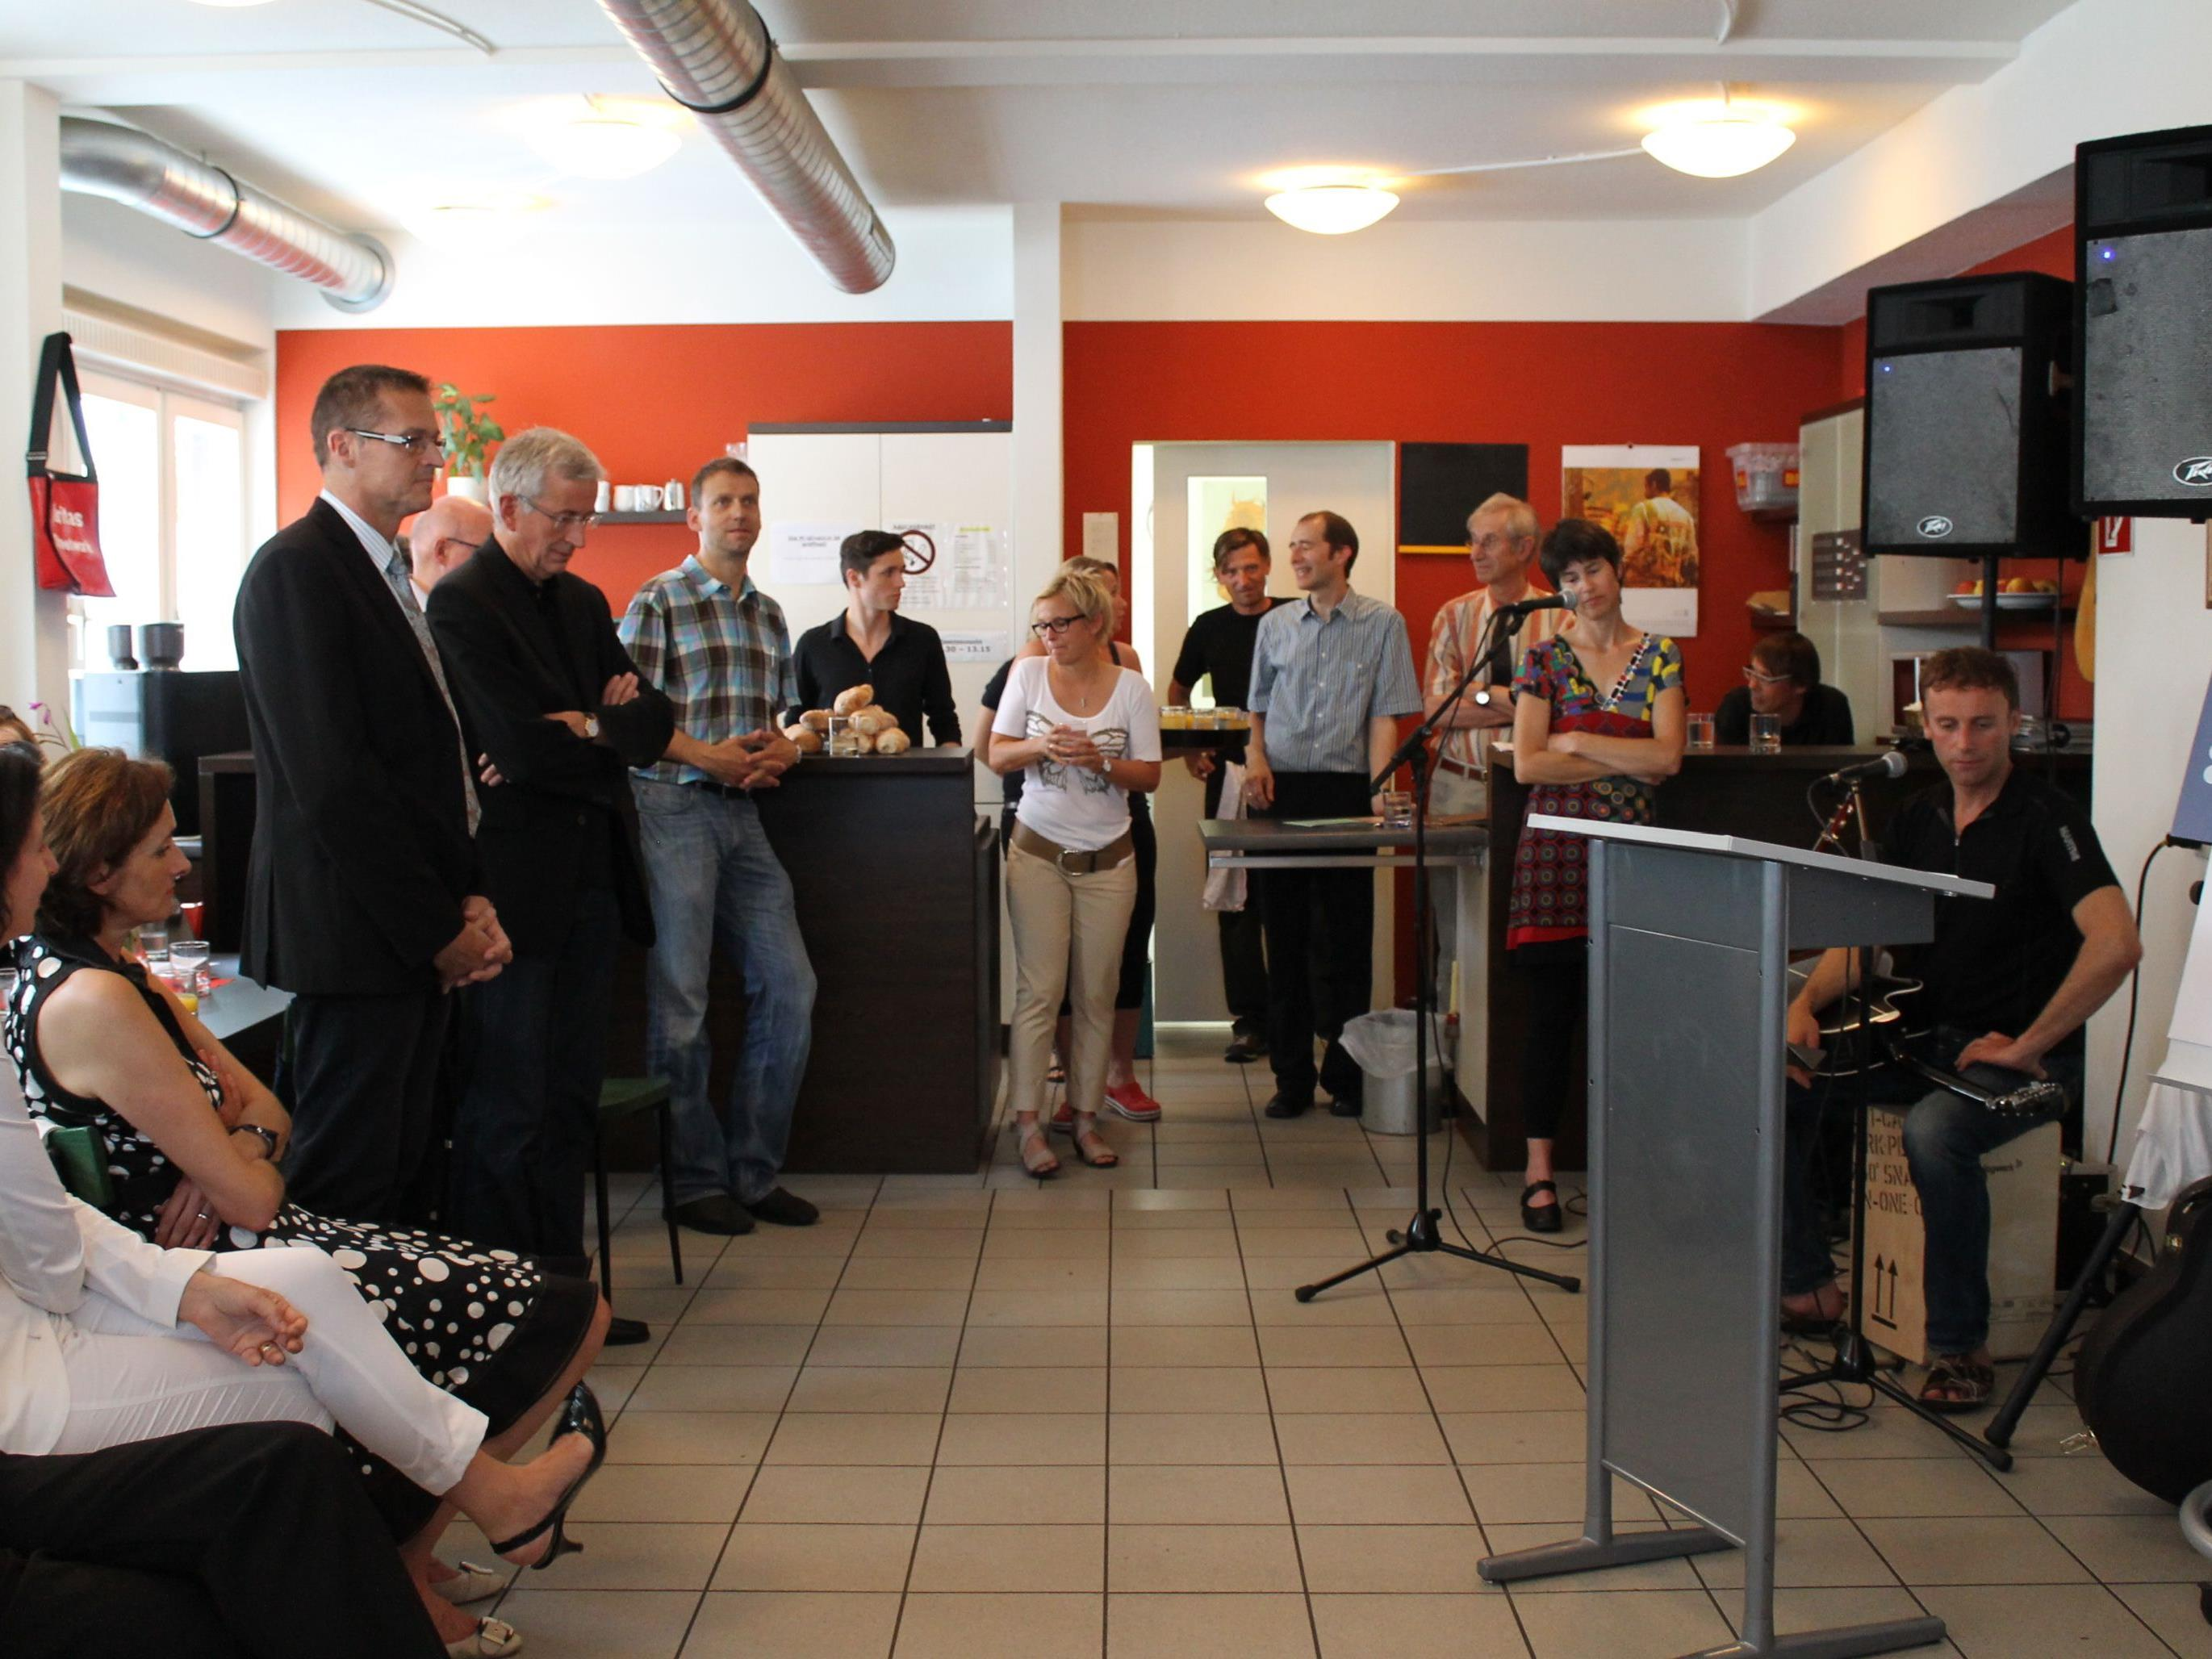 Neueröffnung des Caritas Cafés